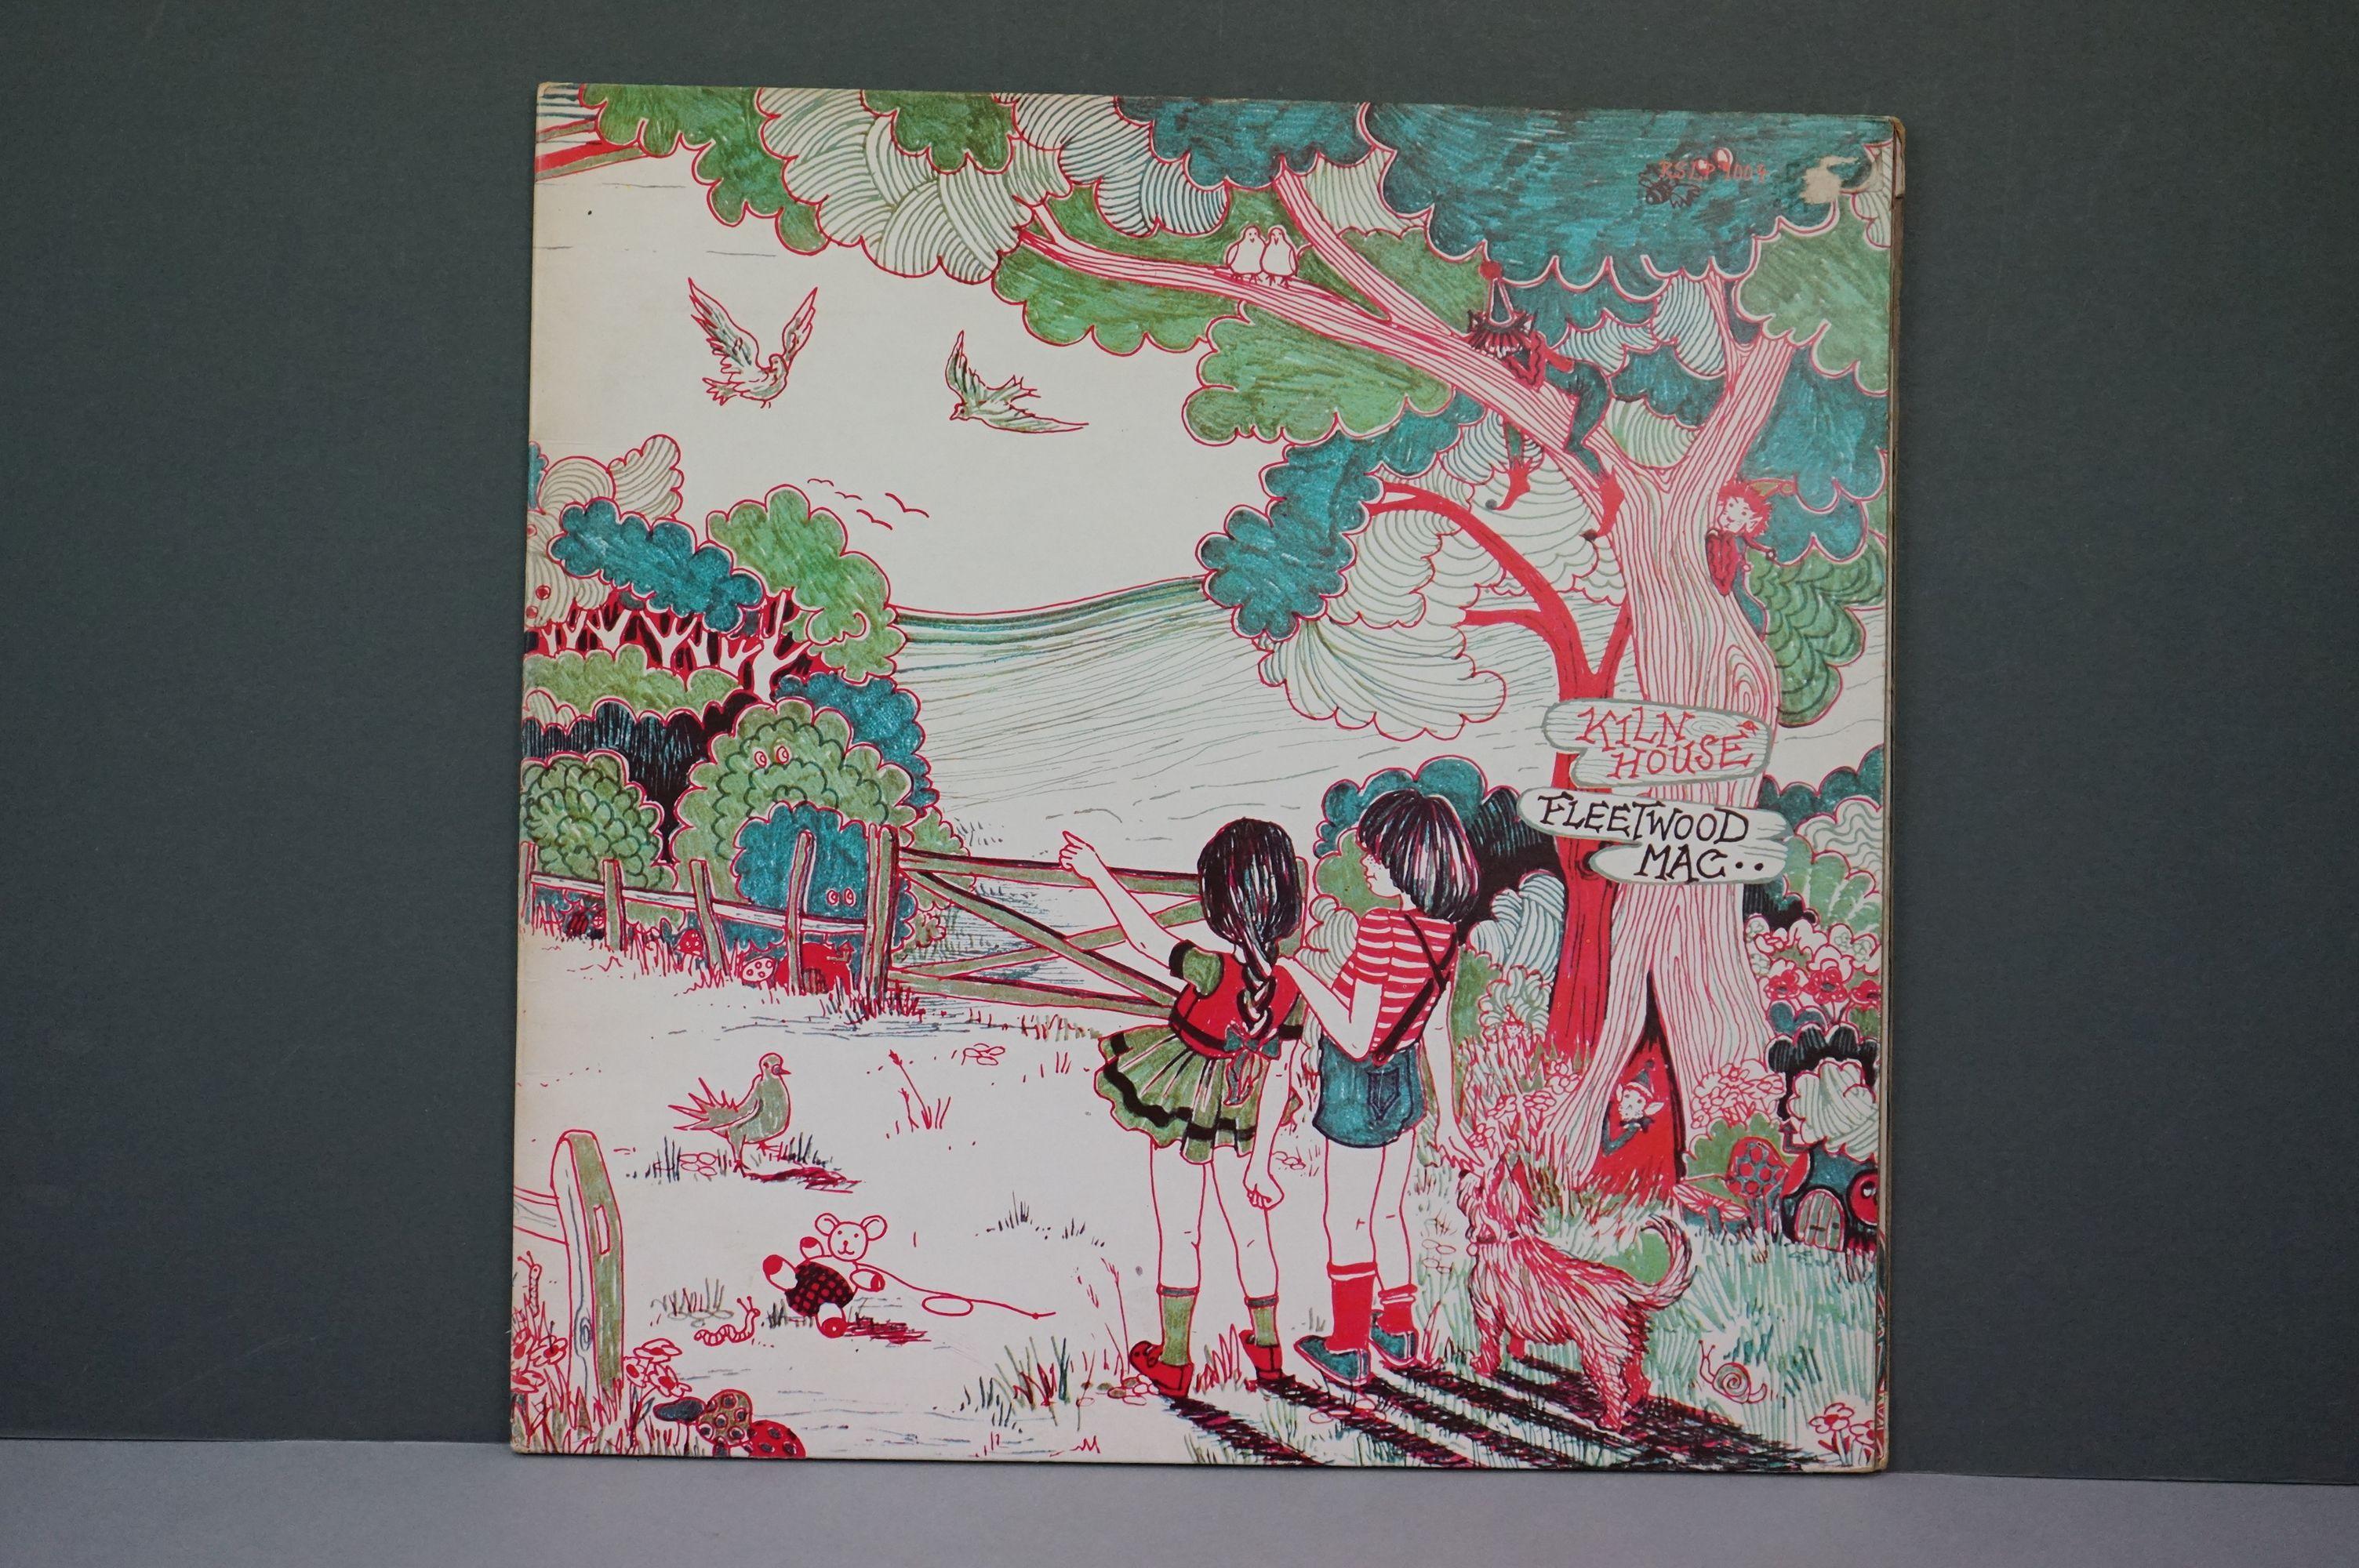 Vinyl - Fleetwood Mac, Kiln House (Reprise RSLP 9004) insert included, sleeve, insert and vinyl vg+